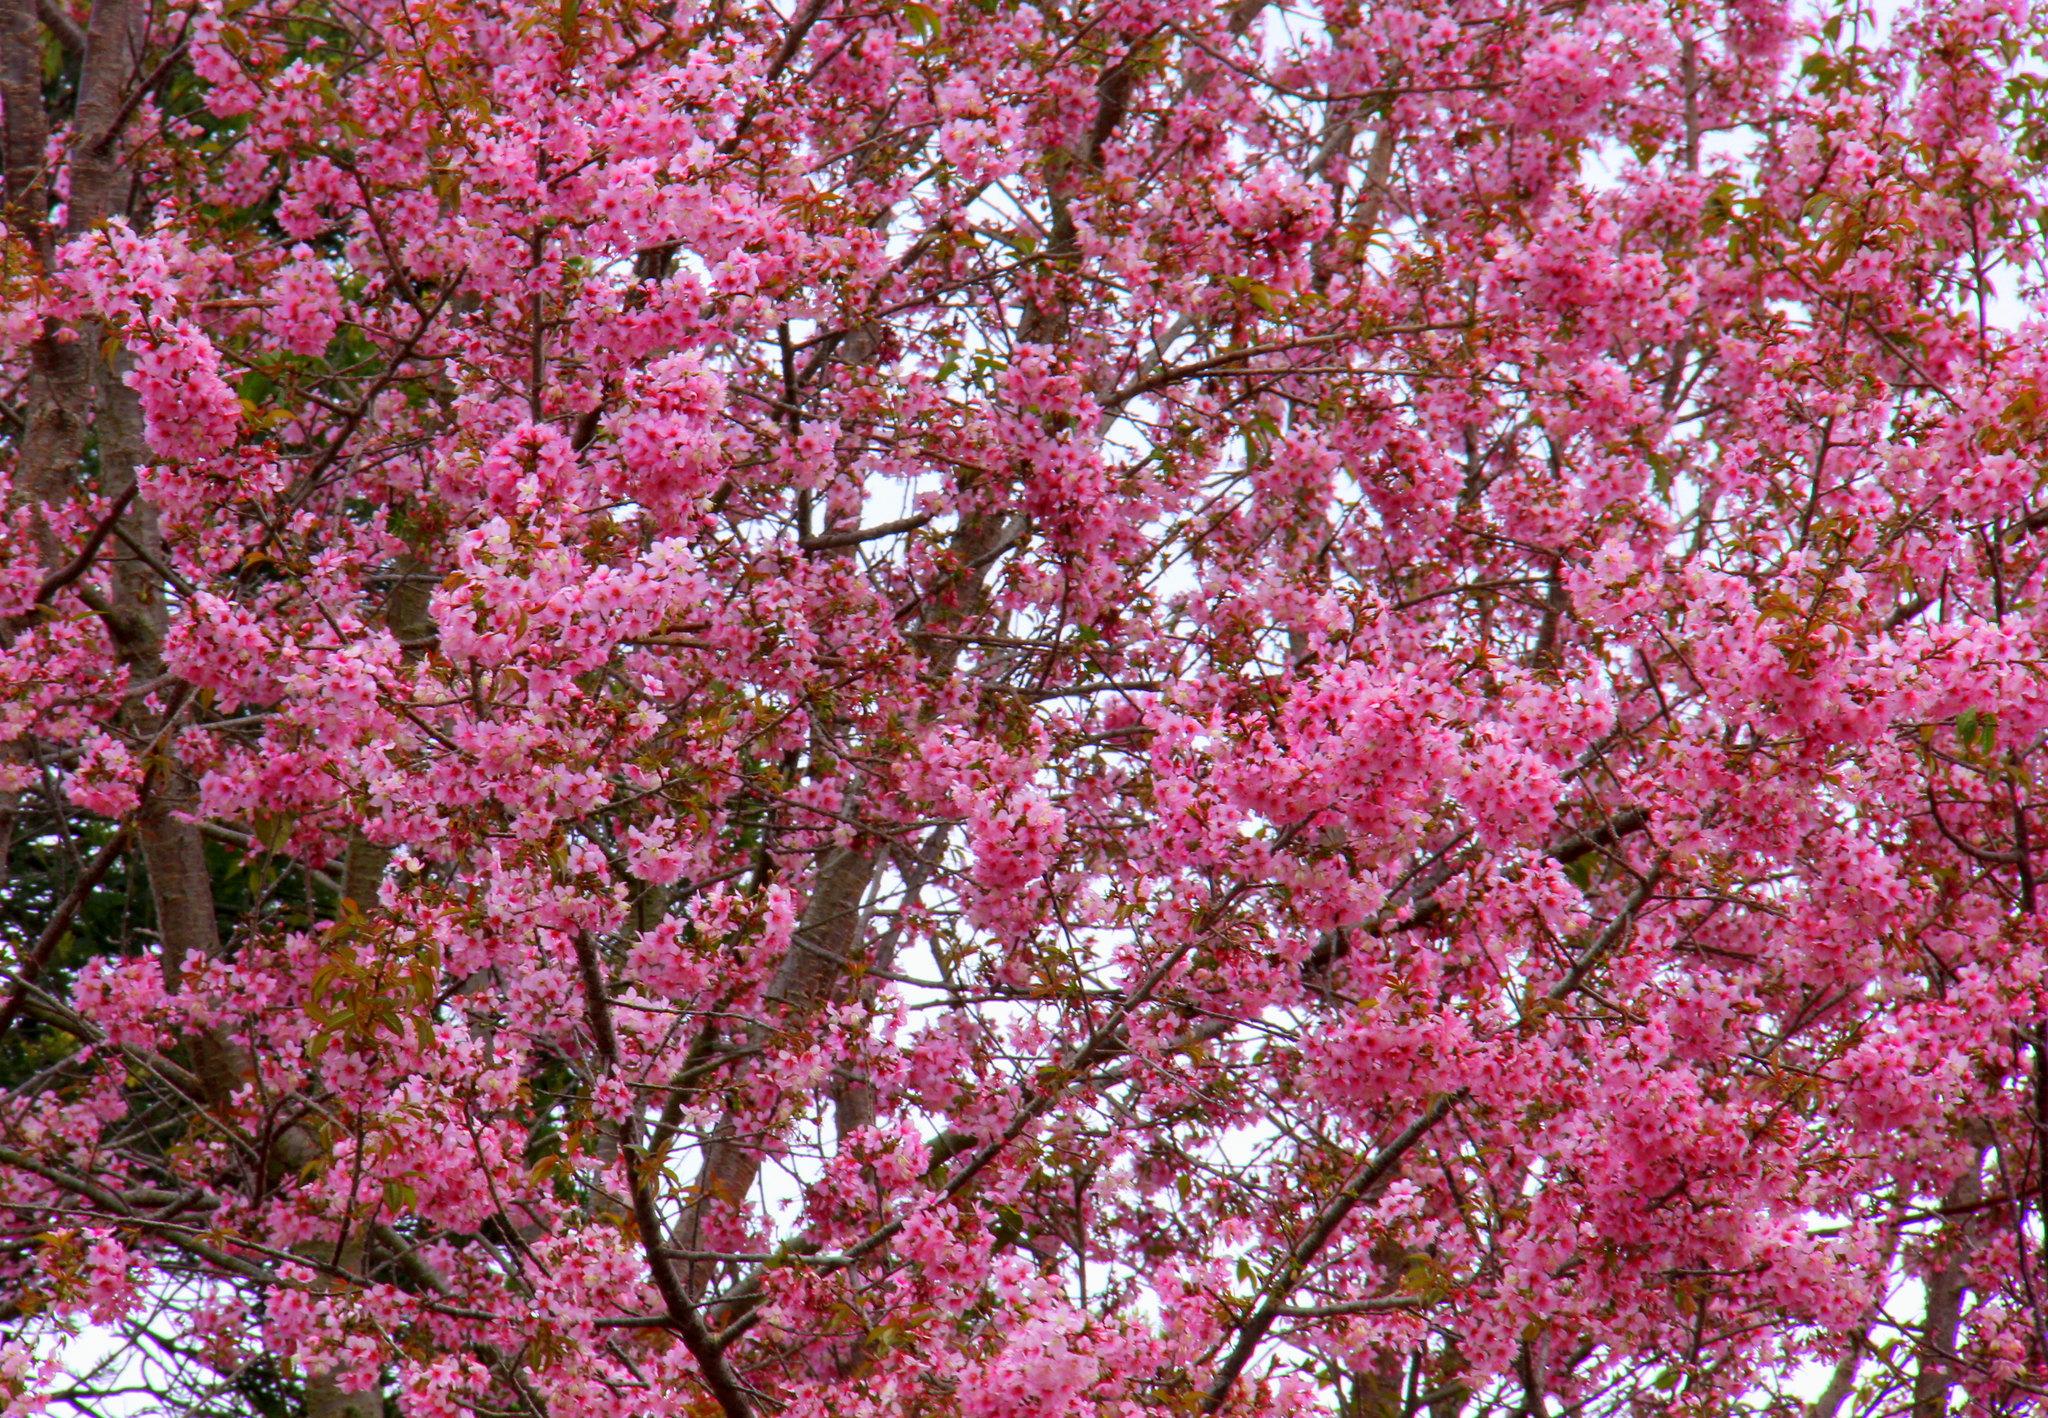 Kodaikanal wild cherry trees bloom in spring